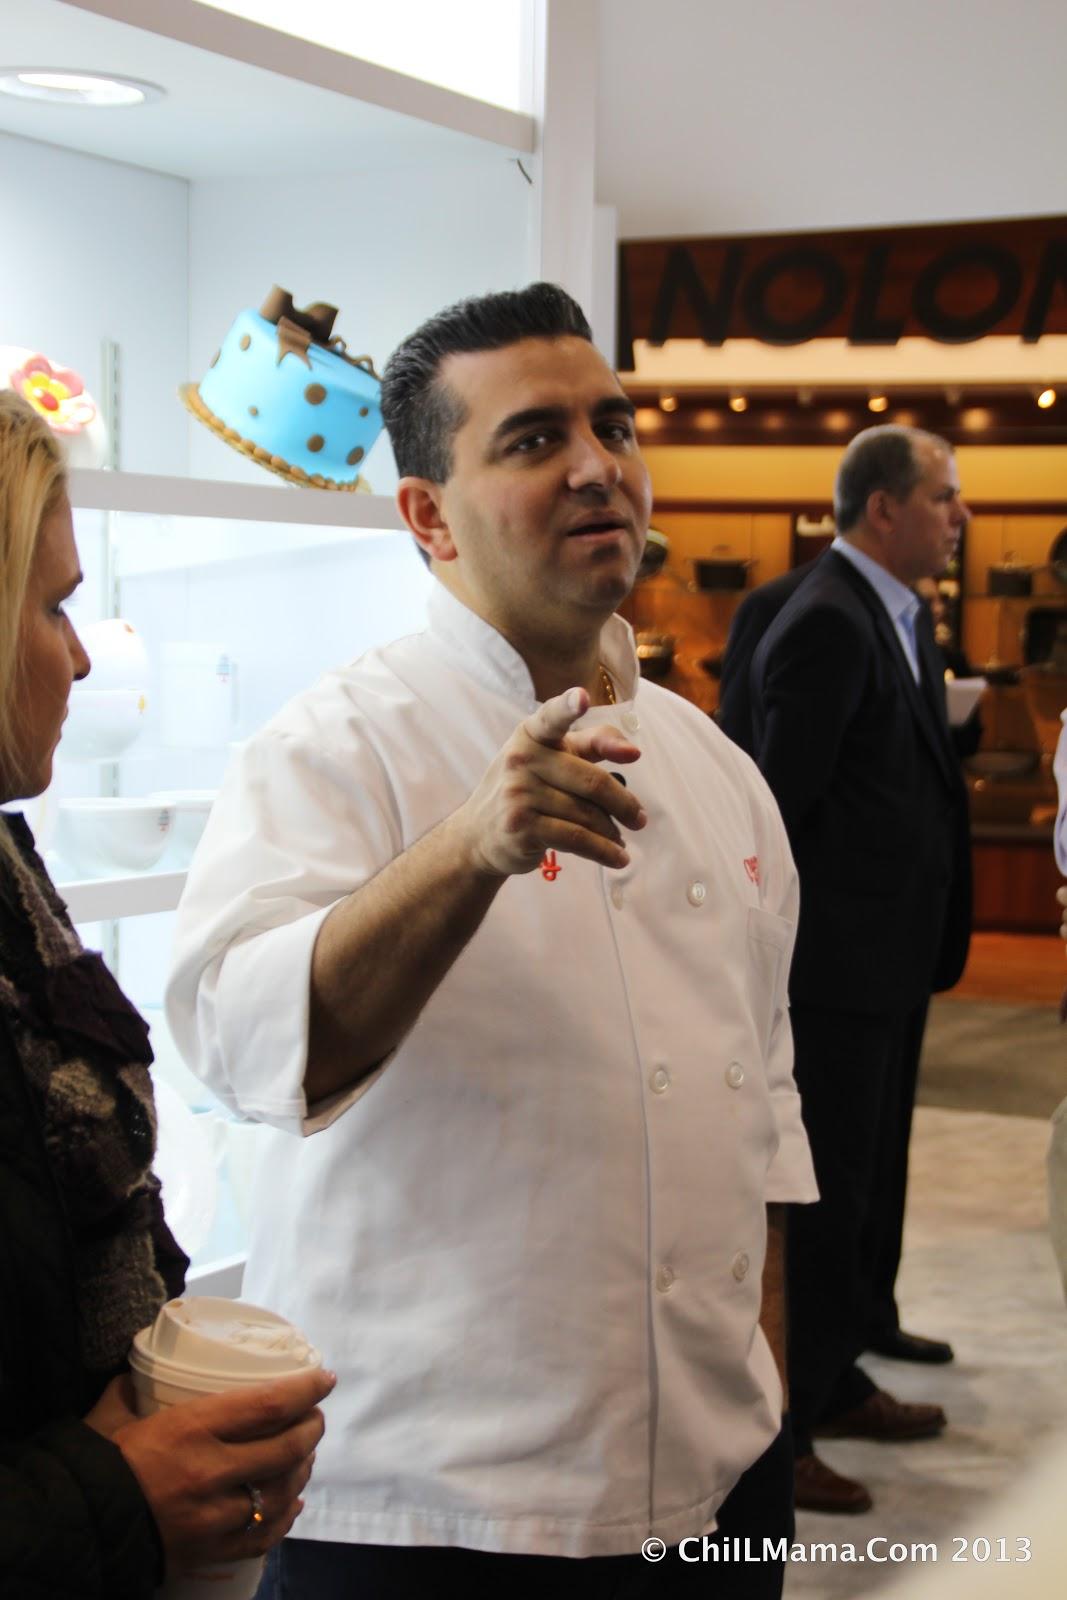 Cake Boss Buddy Valastro and Wife Lisa Family